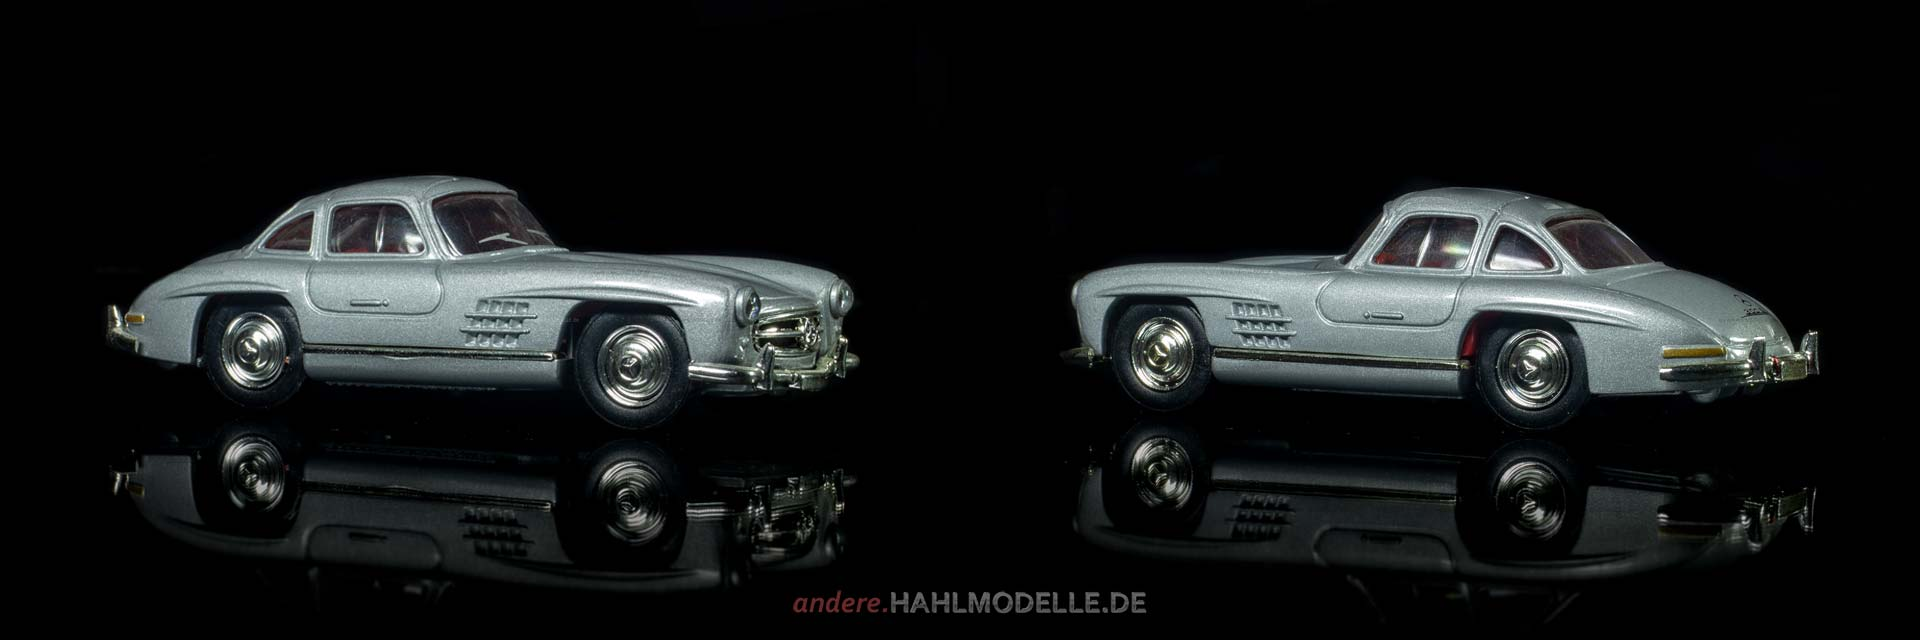 Mercedes-Benz 300 SL (W 198) | Coupé | Ixo | www.andere.hahlmodelle.de